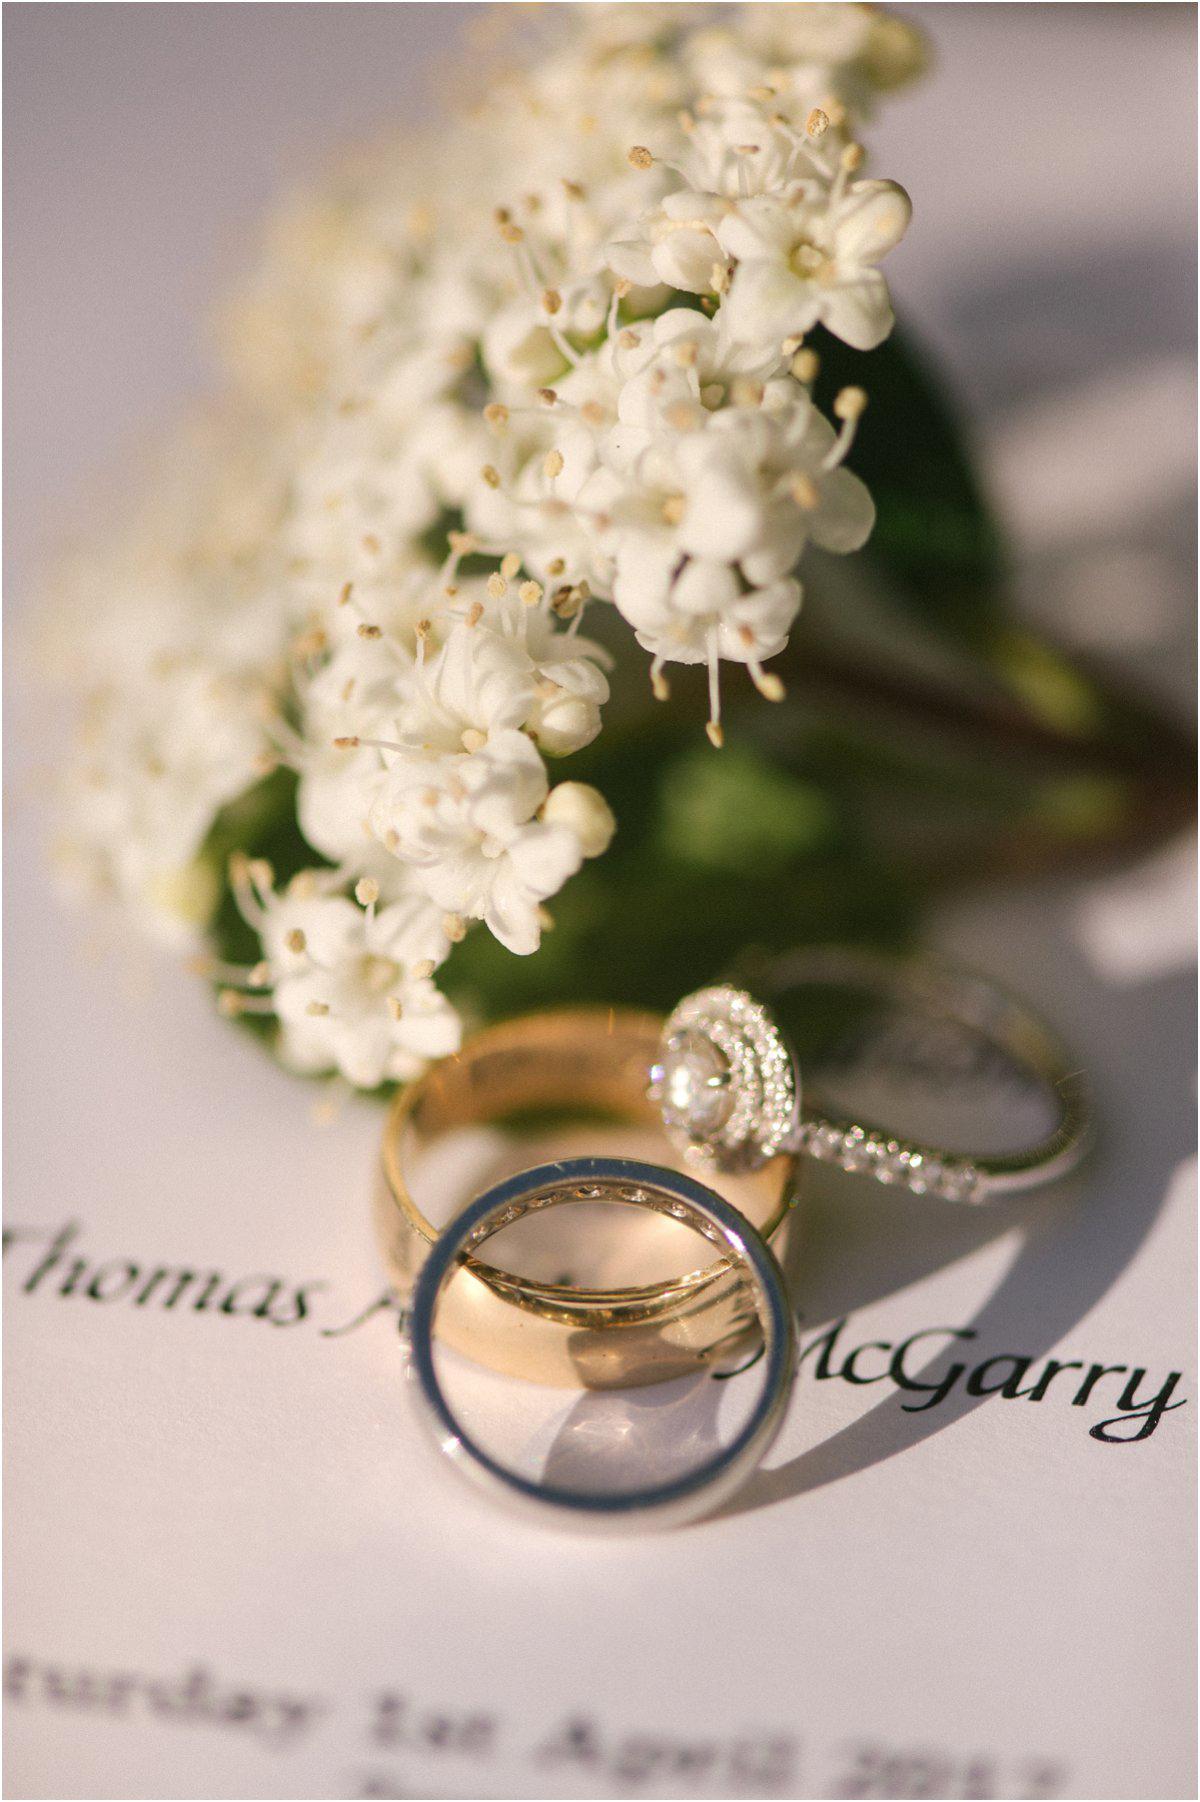 Crofts&Kowalczyk_DundasCastle_WeddingPhotography_Hannah&Tom-102.jpg